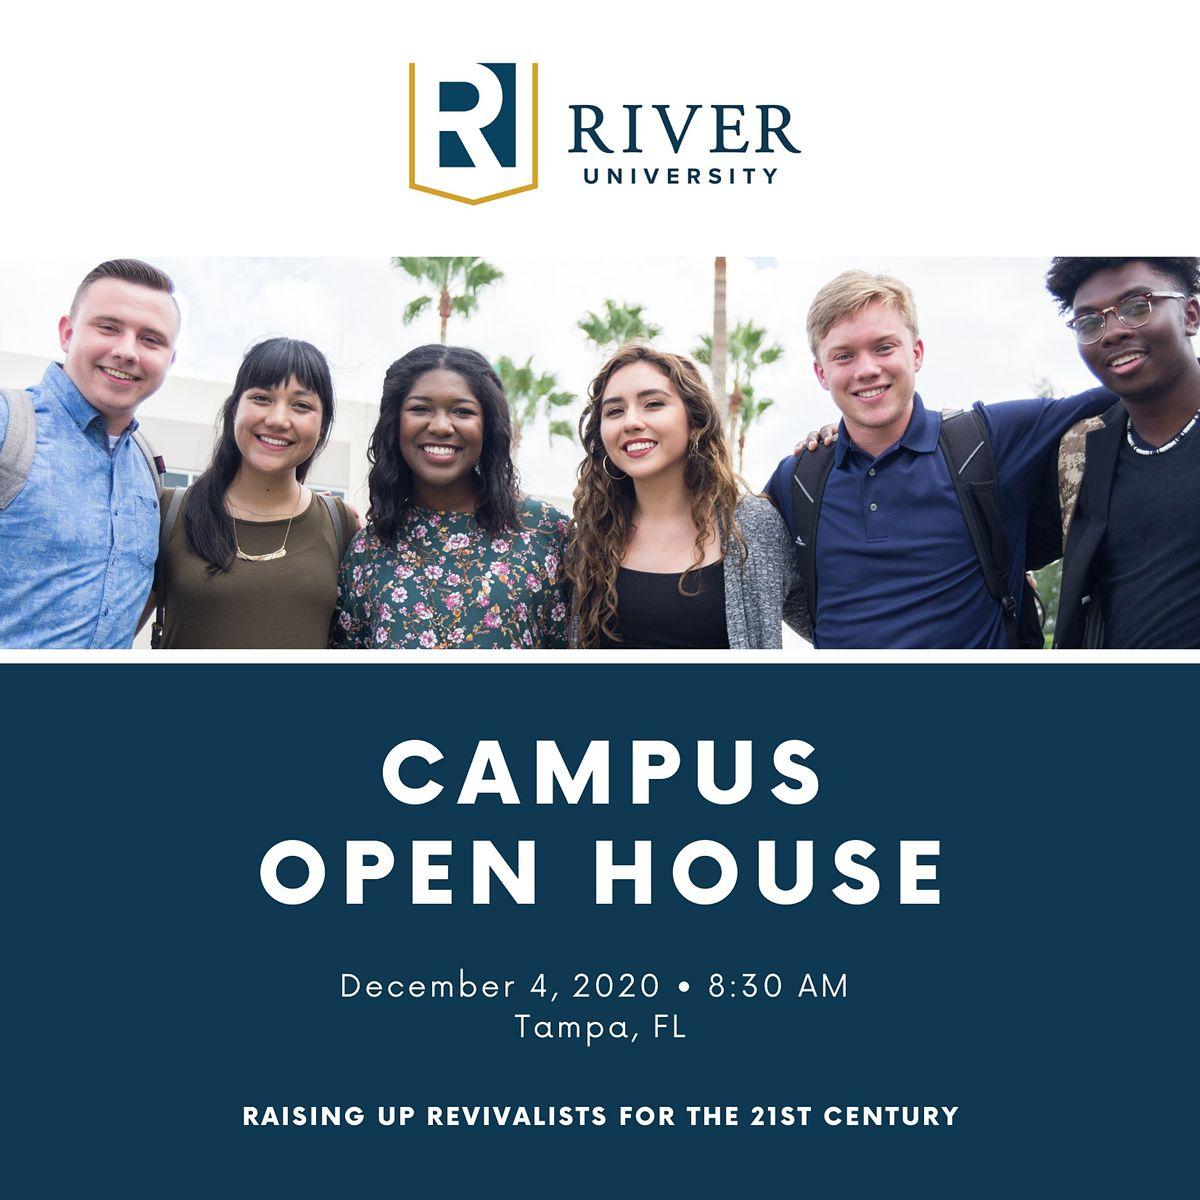 River University Open House